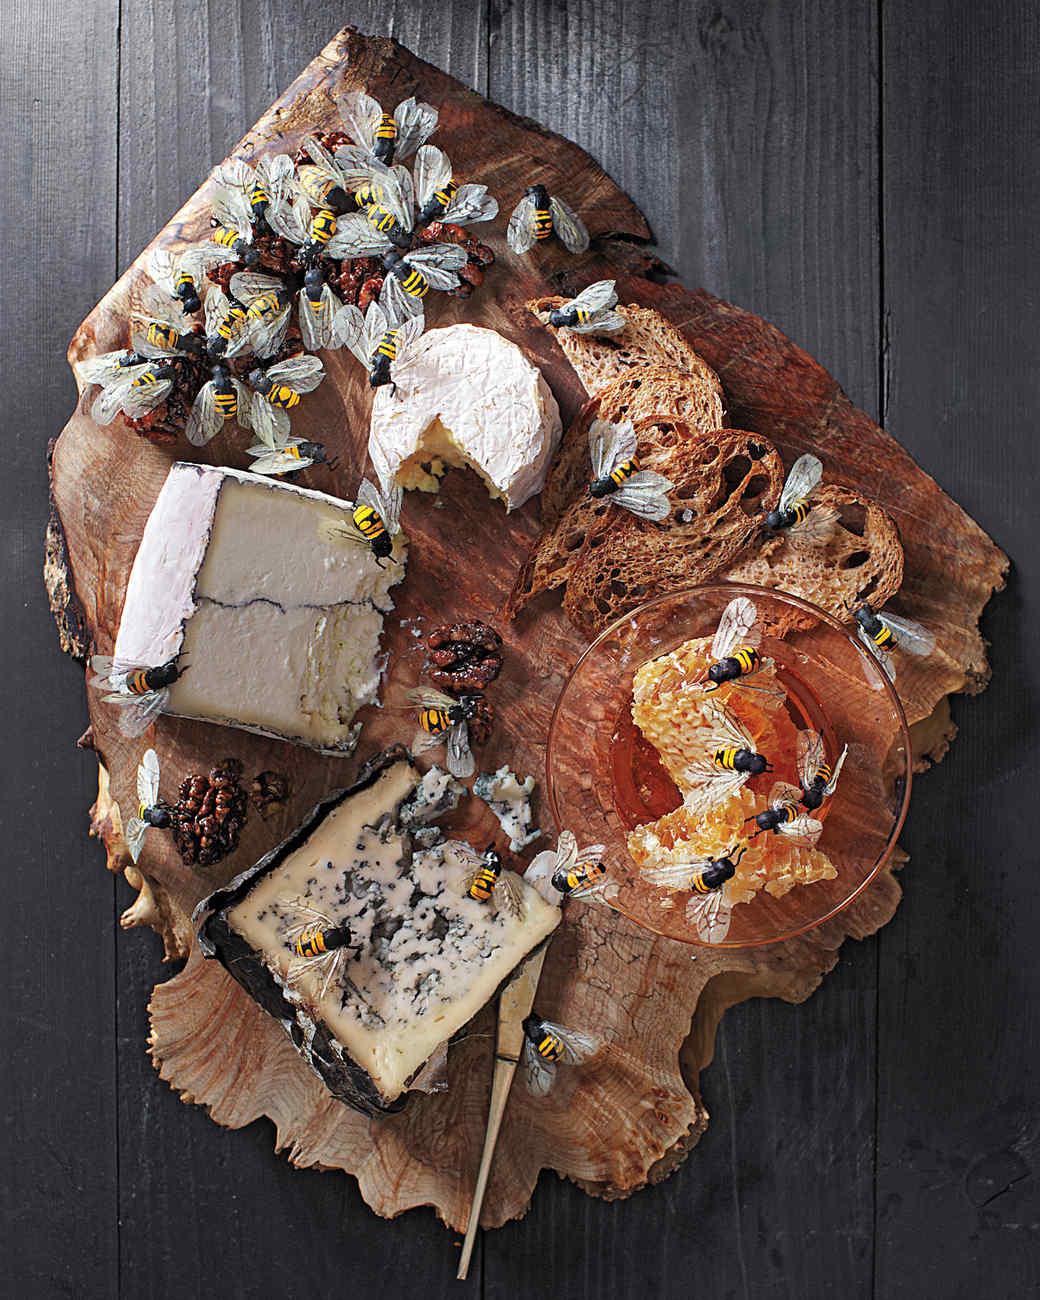 cheese-plate-phobias-1011mld107647.jpg